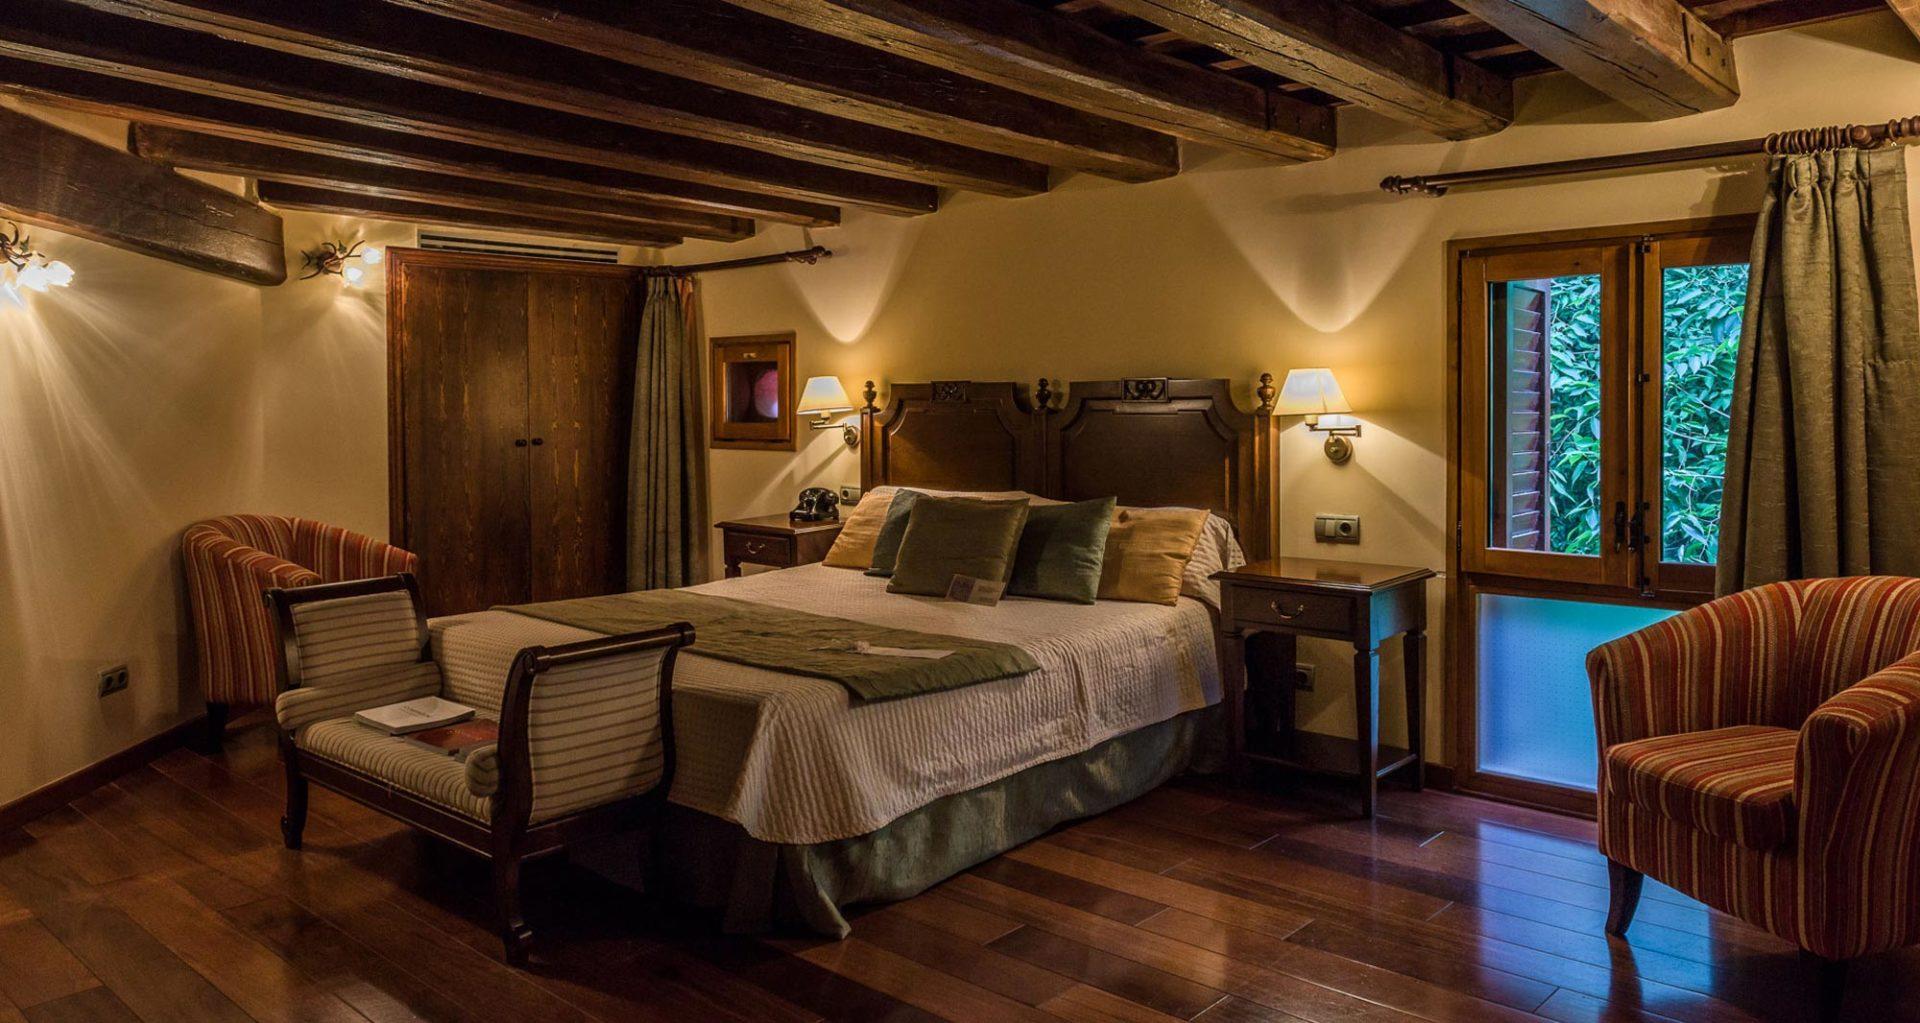 Hotel Villa Retiro Xerta Ebre escapada fin de semana romantico restaurante estrella michelin